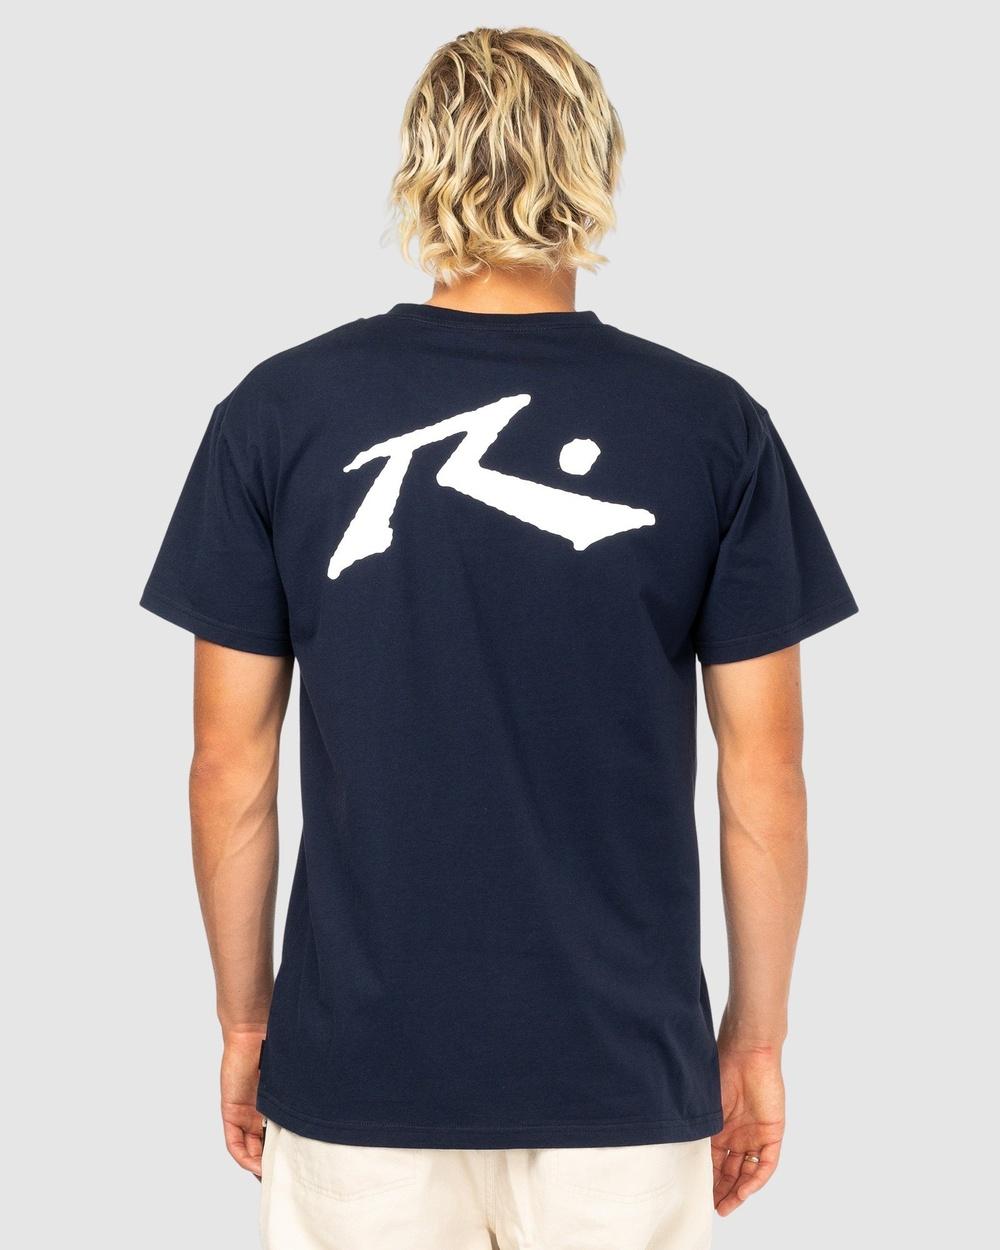 Rusty Competition Short Sleeve Tee T-Shirts NVB Australia